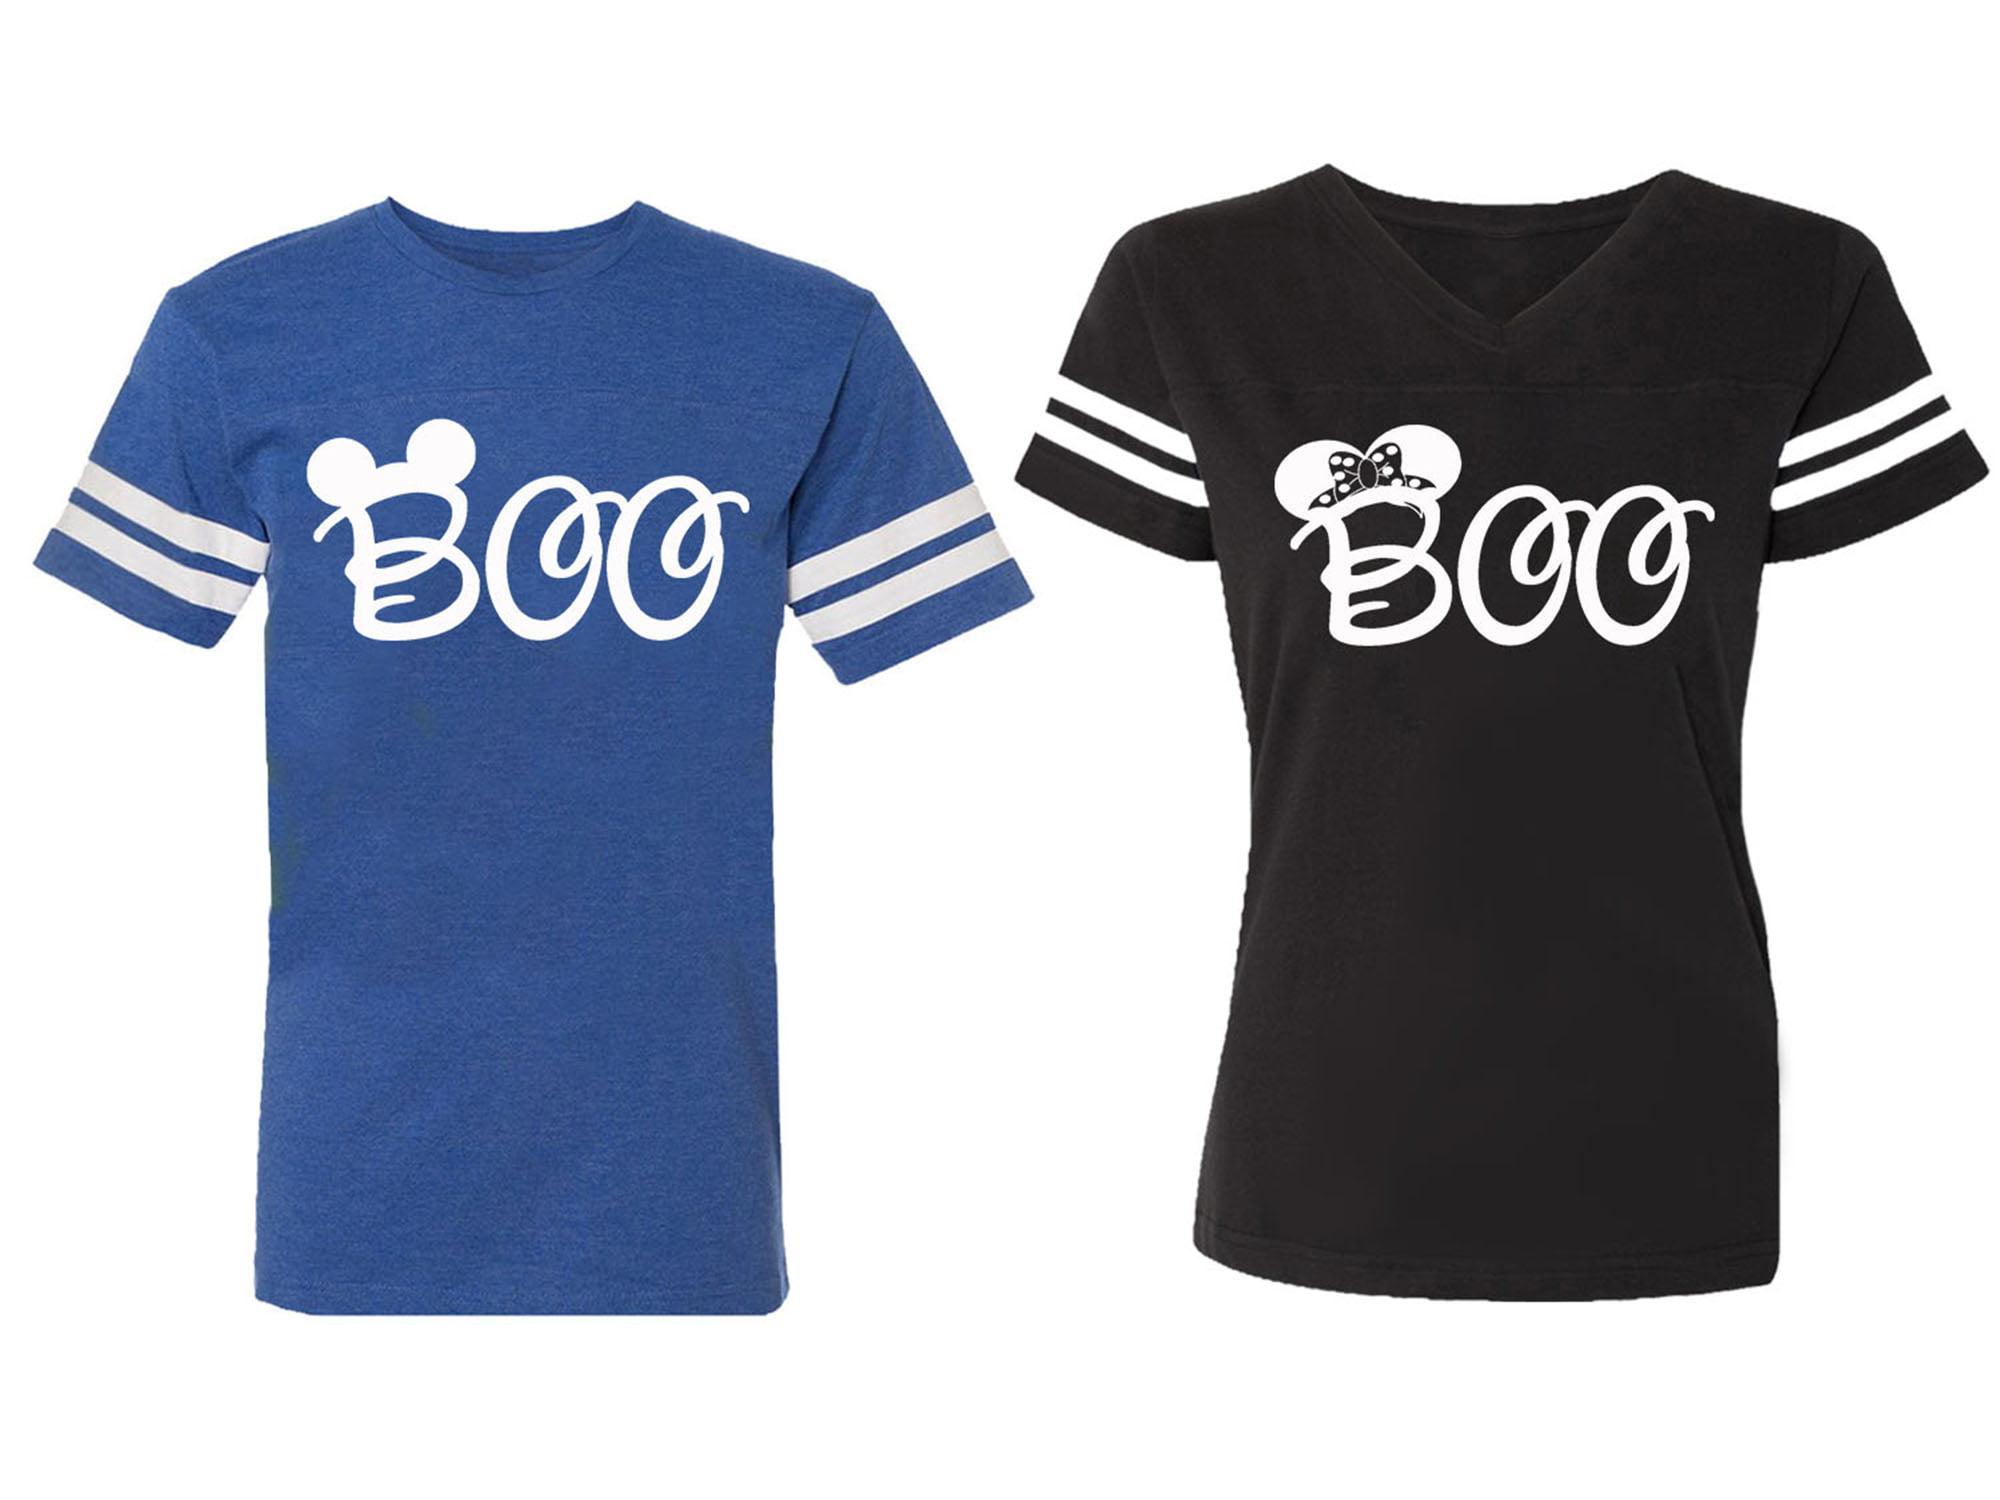 OXI - Halloween Boo Matching Cotton Jerseys (Royal / Black ...